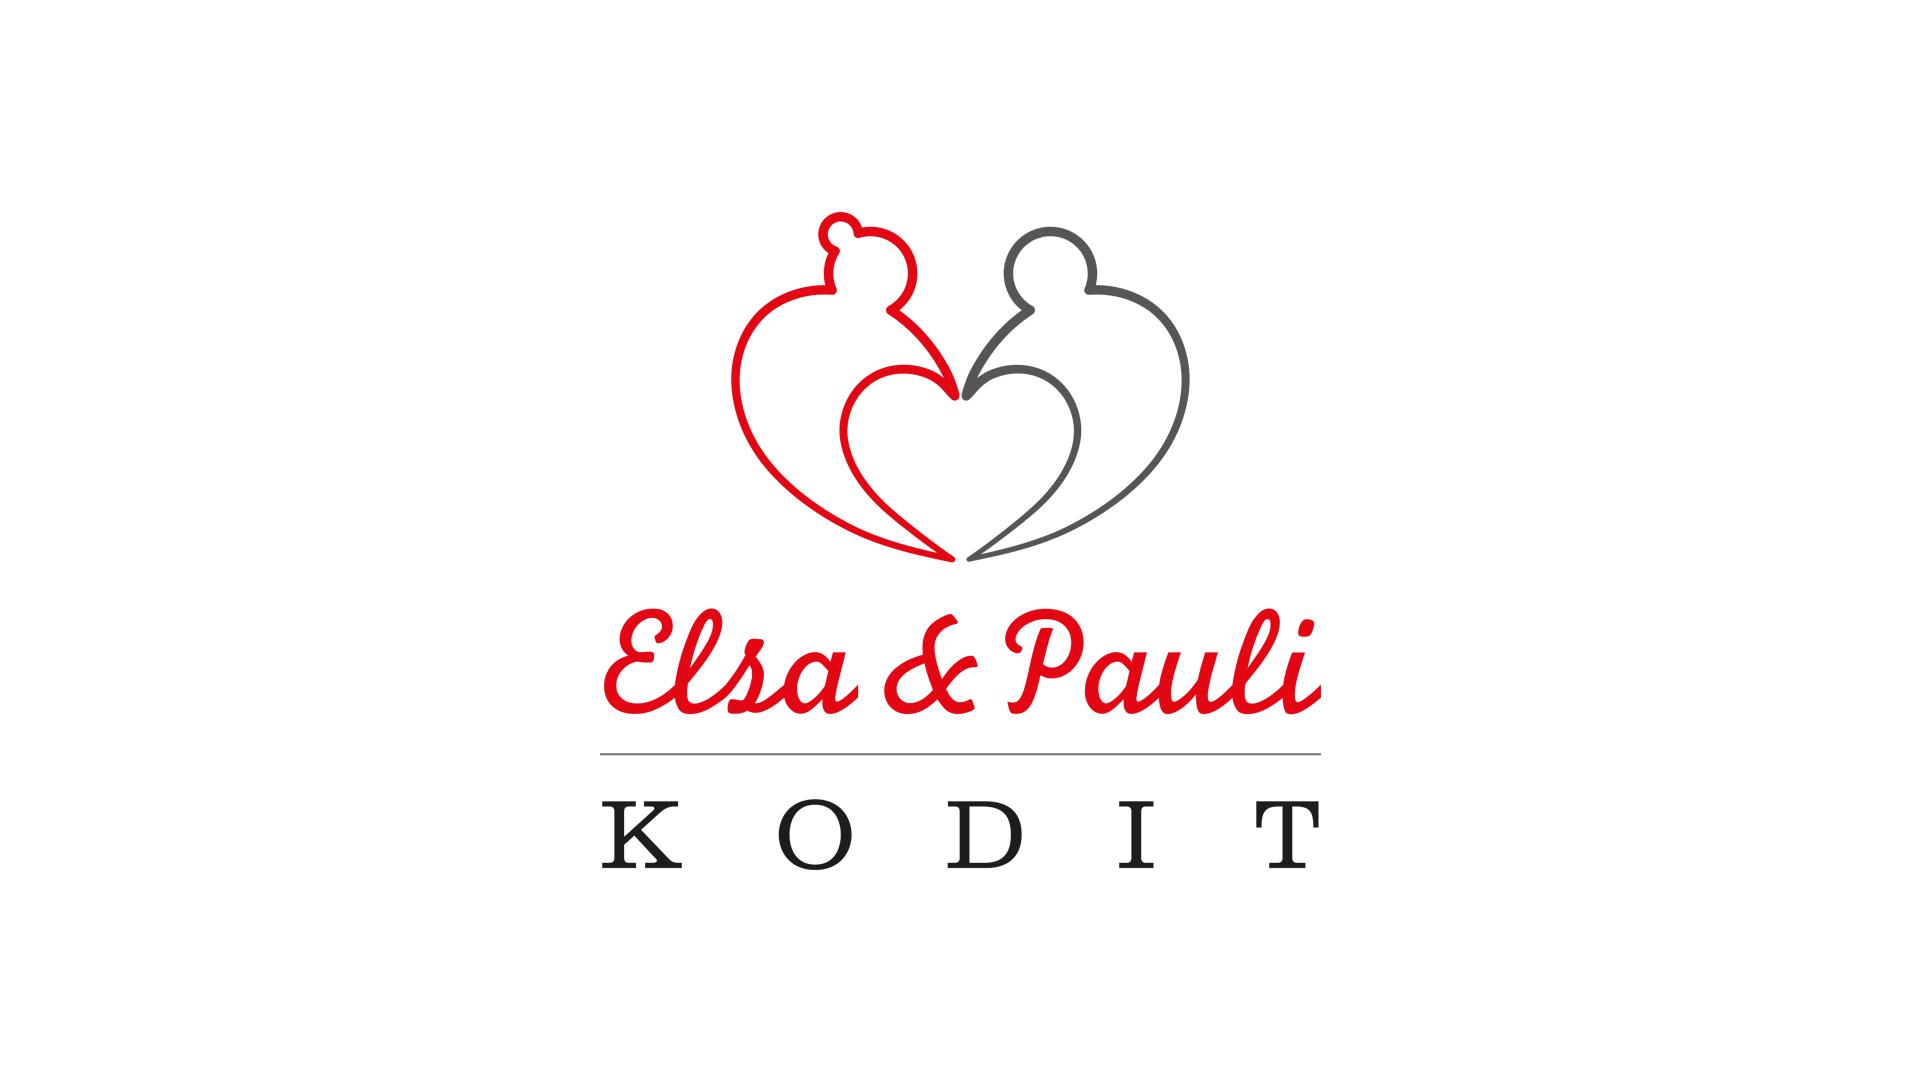 Elsa ja Pauli kodit, logo